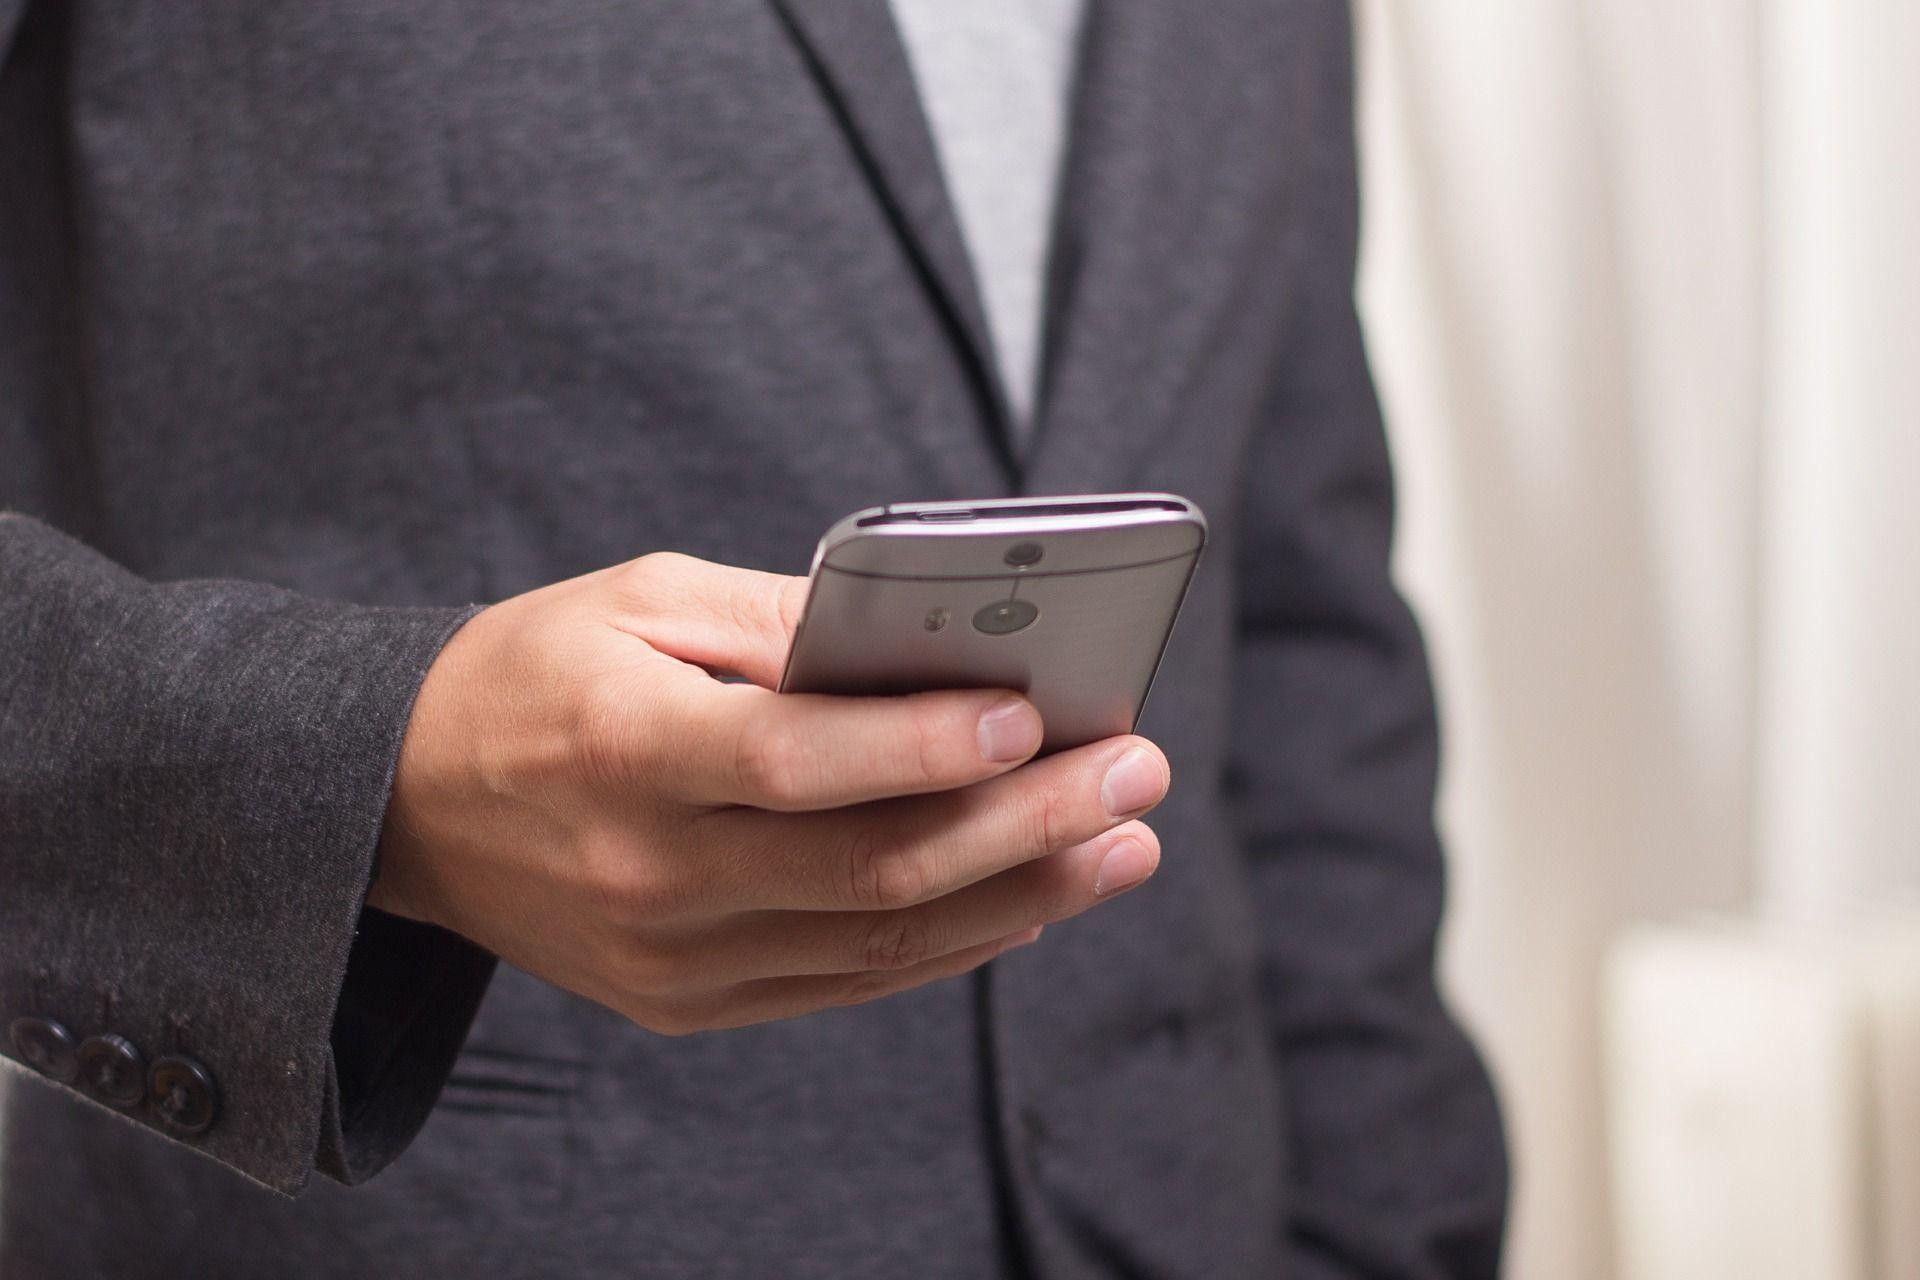 Avisos mediante SMS: Servicios de Farmacia-Óptica Ojeda